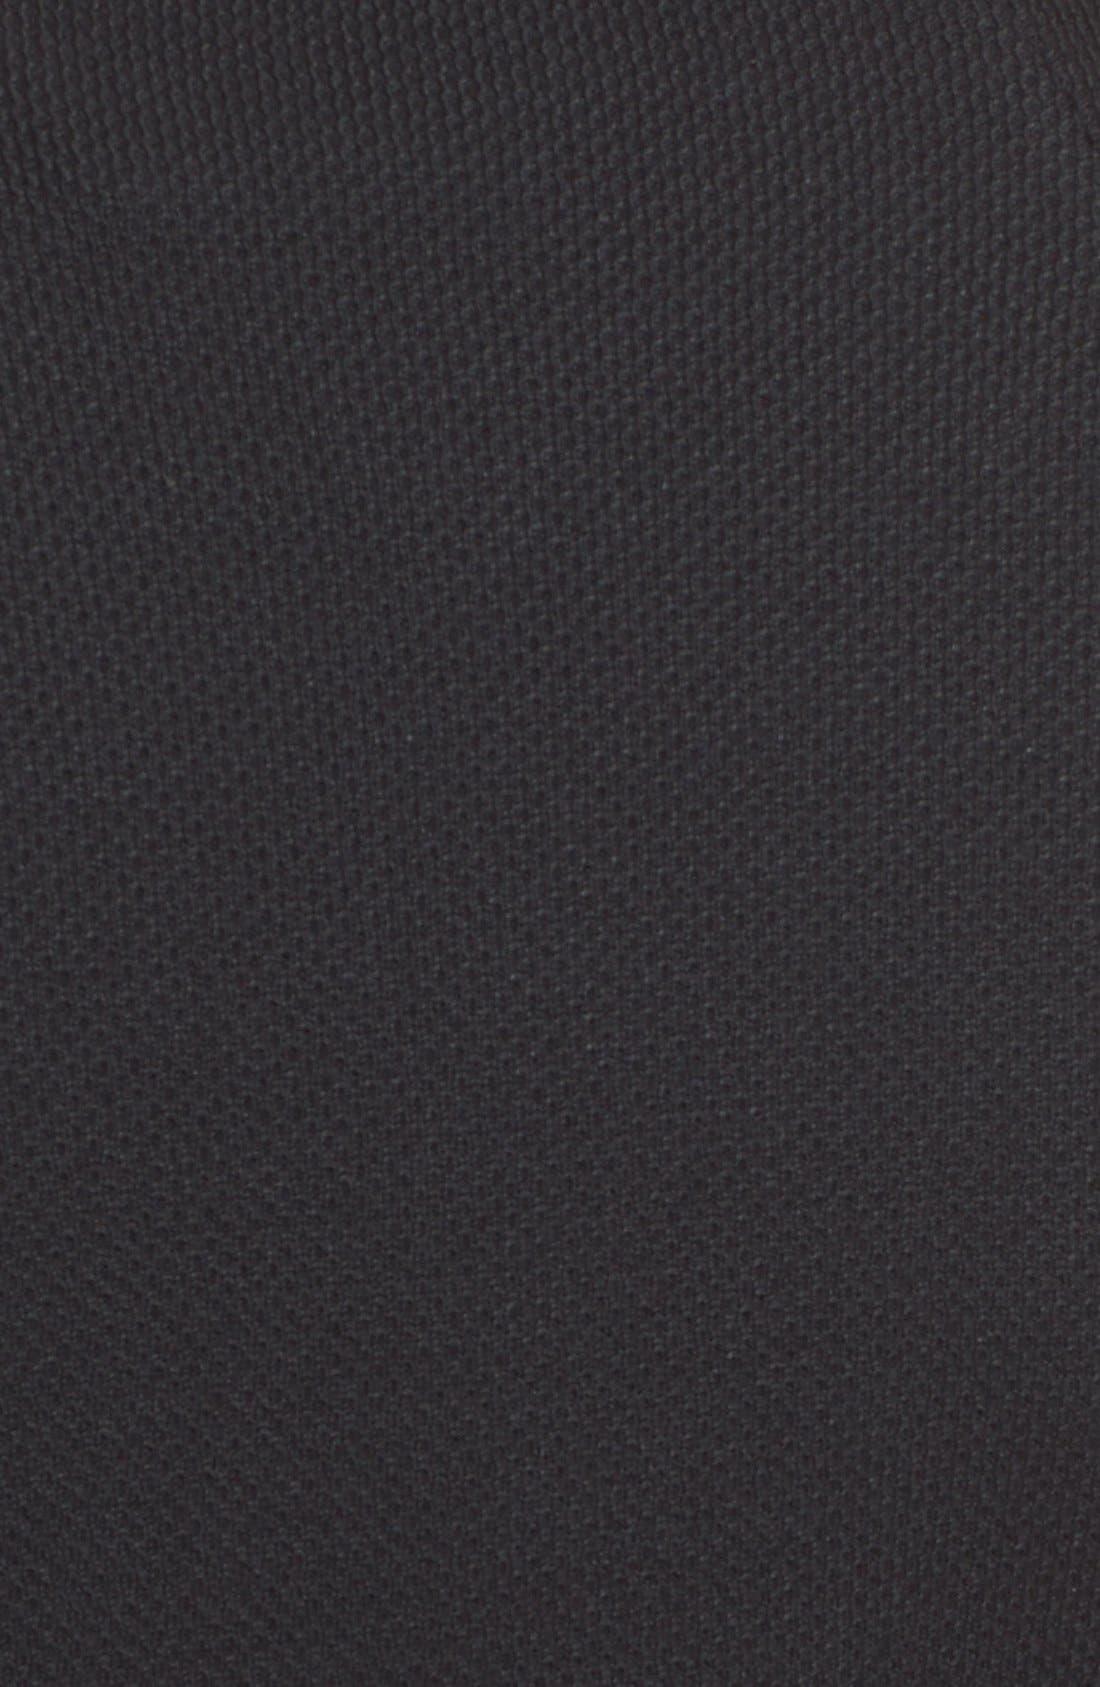 Alternate Image 3  - St. John Collection Milano Piqué Knit Jacket